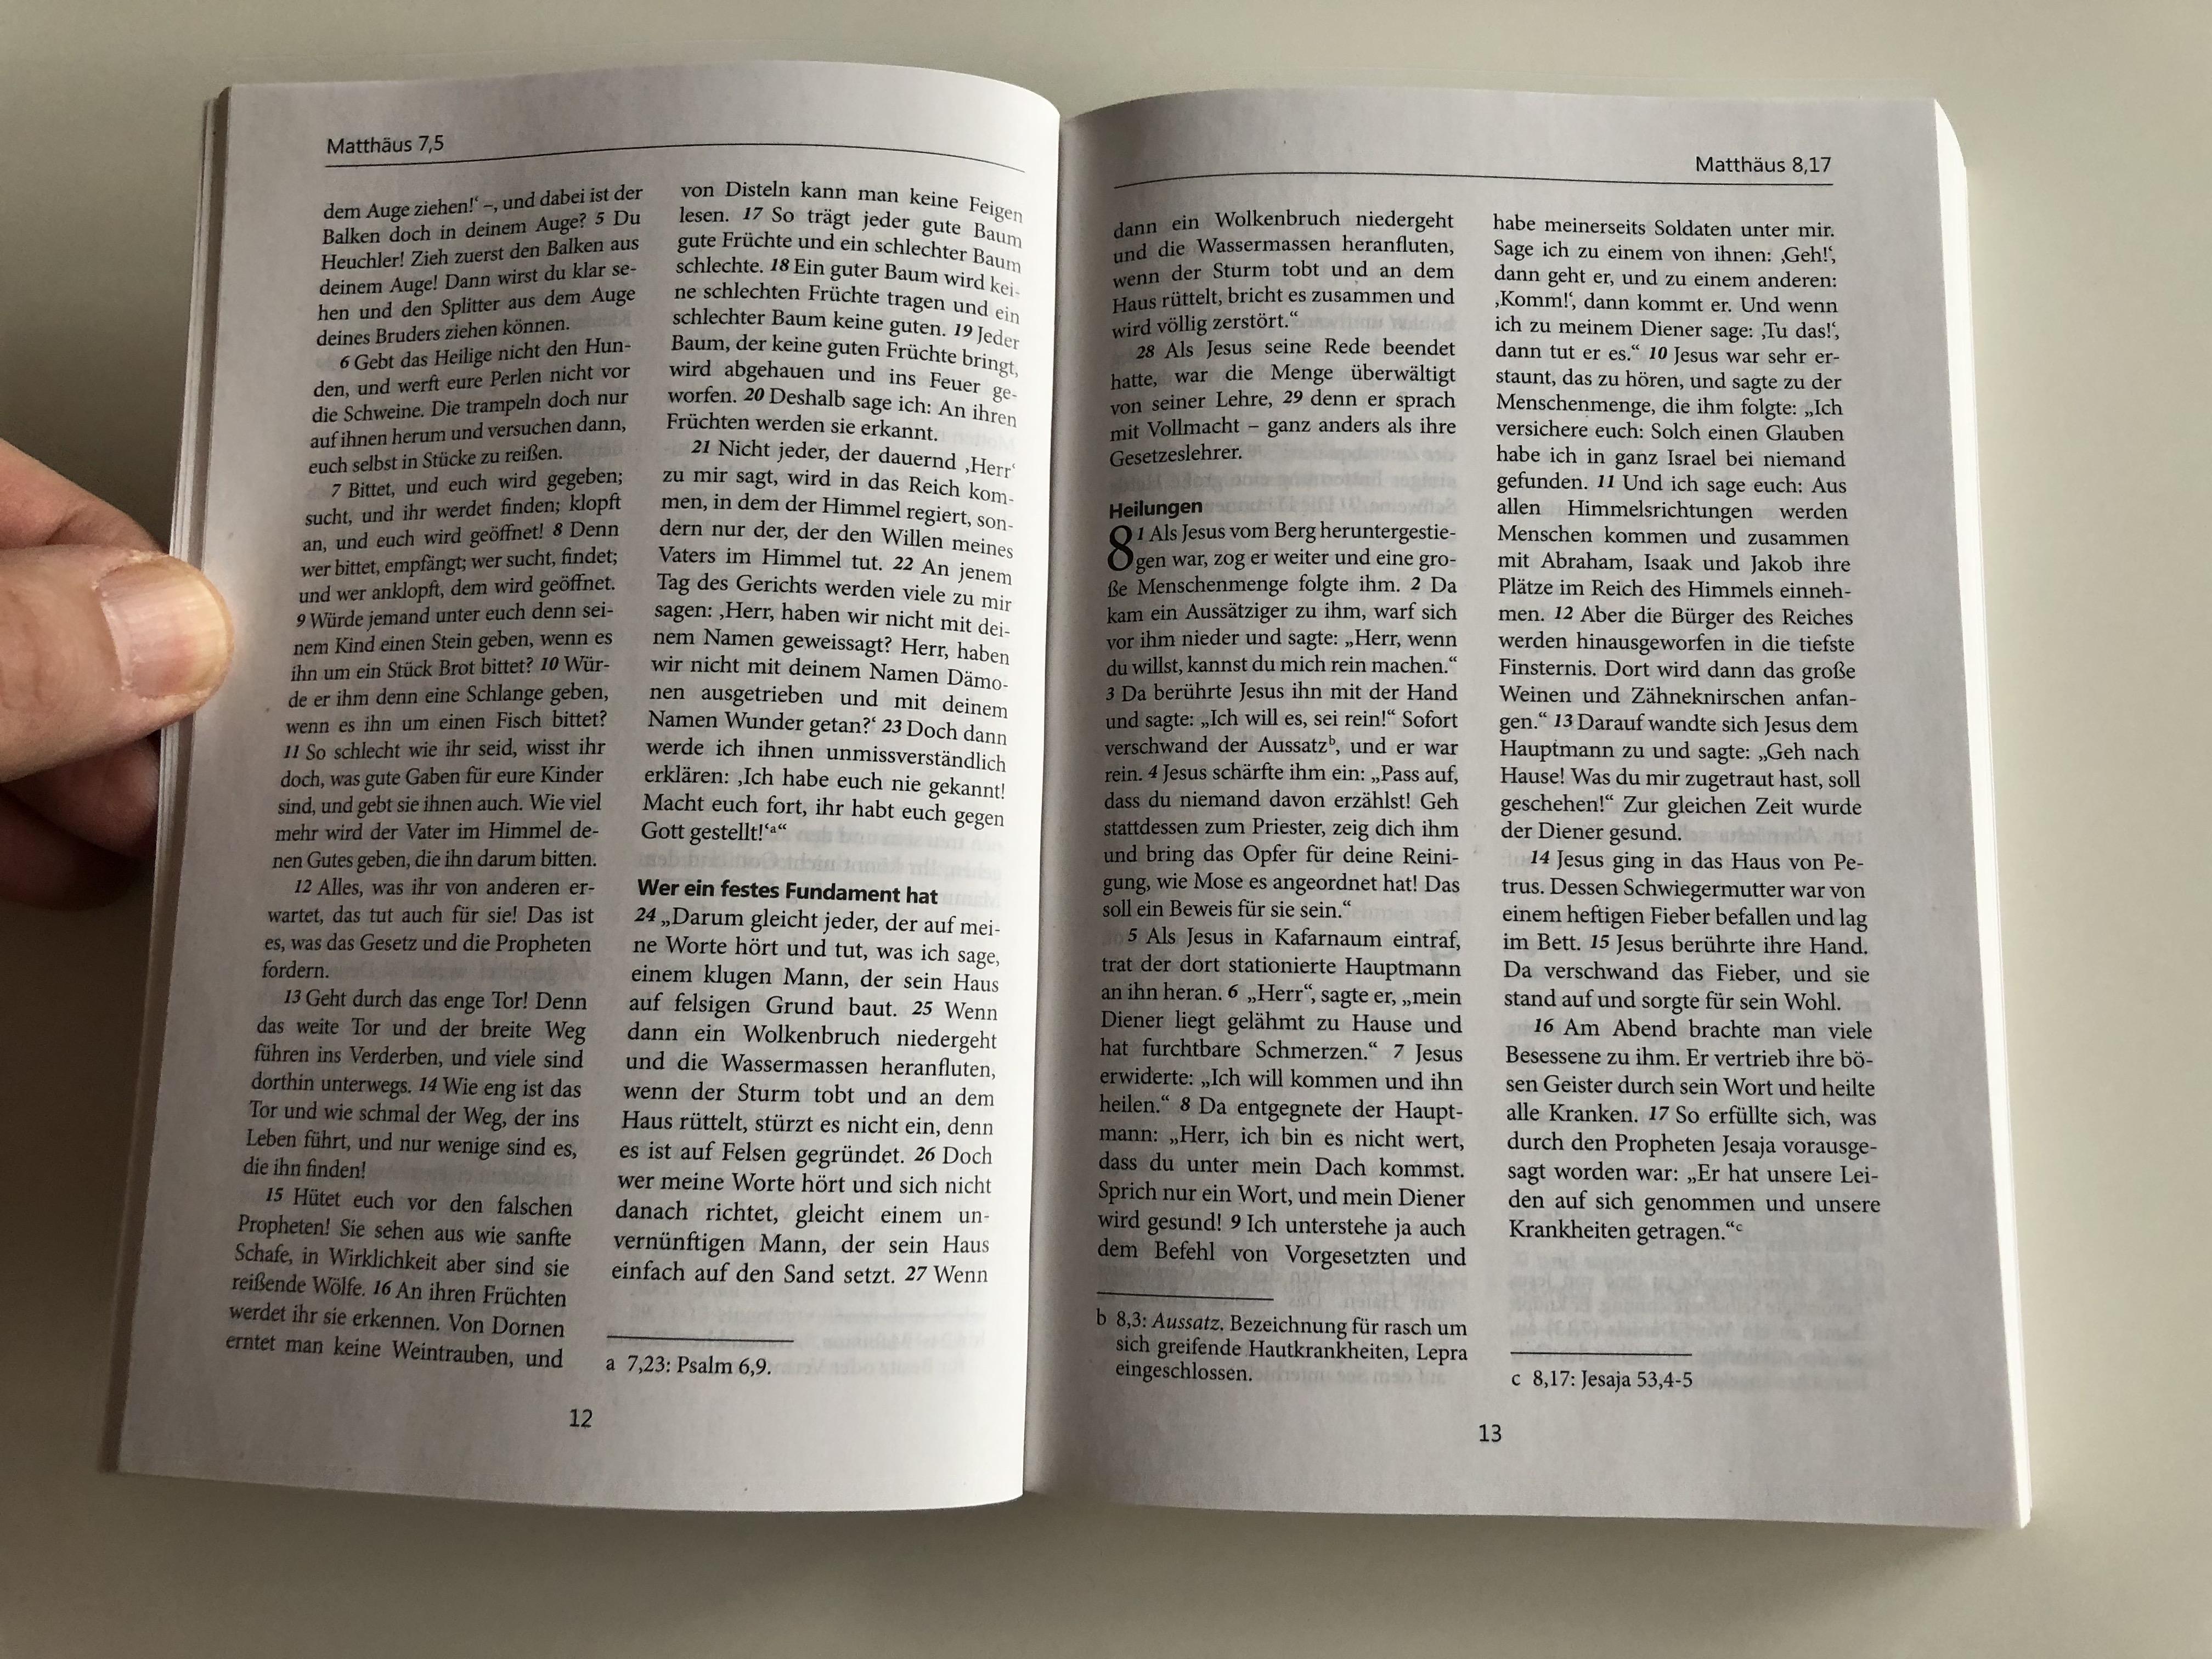 bibel.heute-german-language-nt-with-psalms-5.jpg